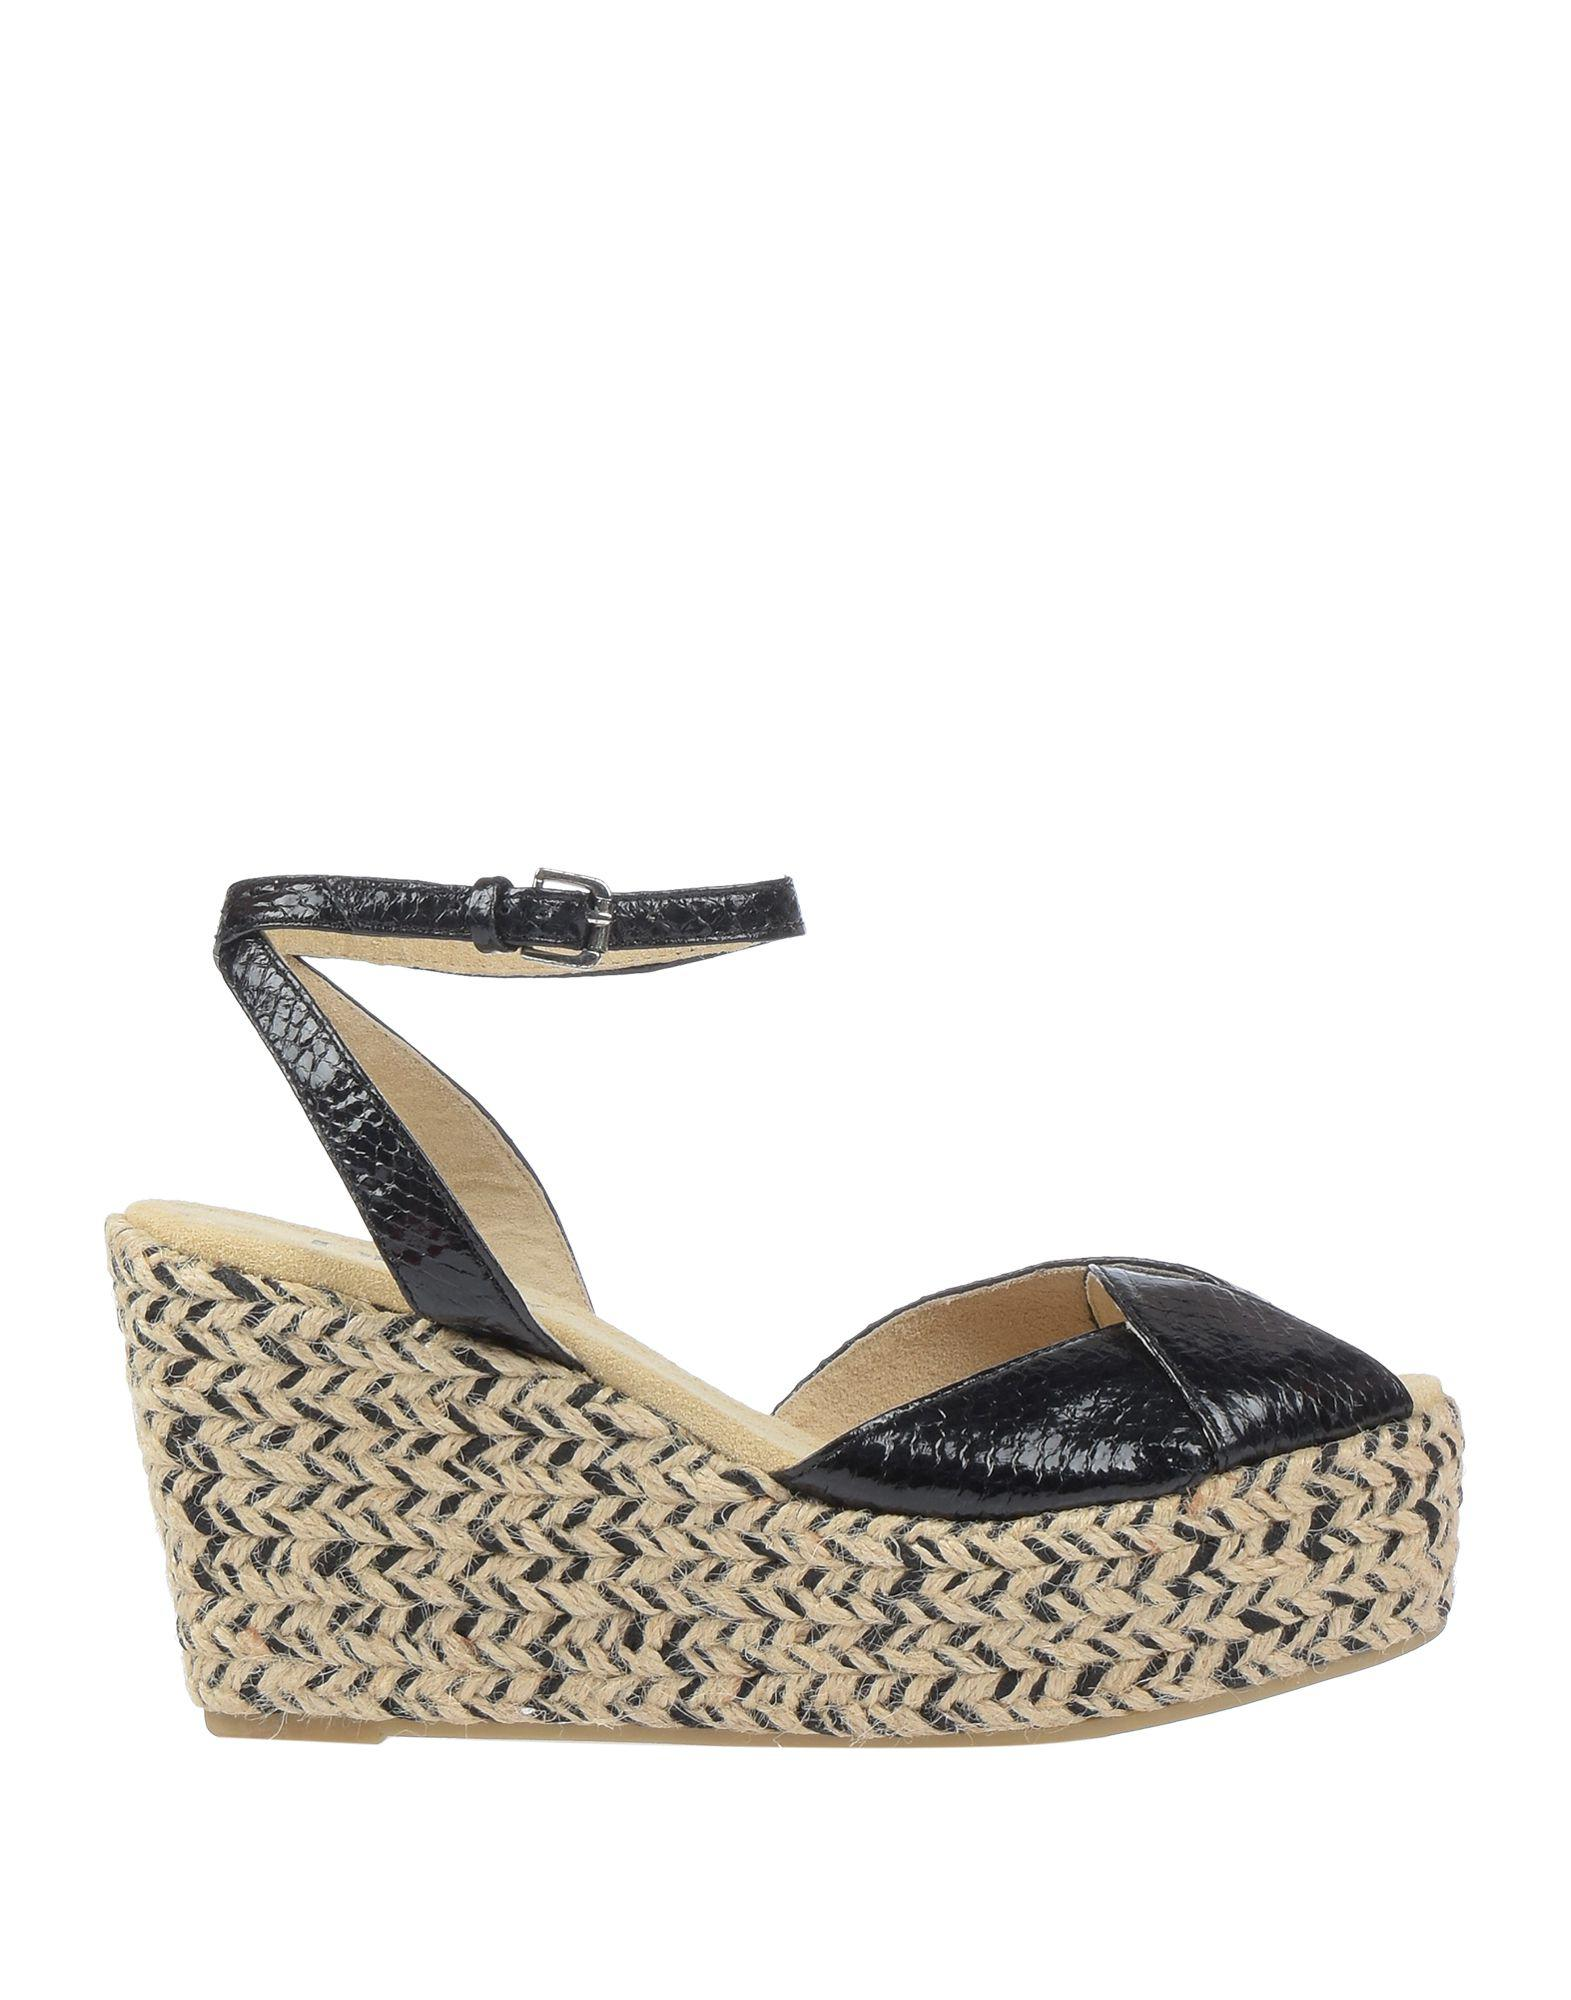 64bd0fc11e05 Dkny Sandals in Black - Lyst